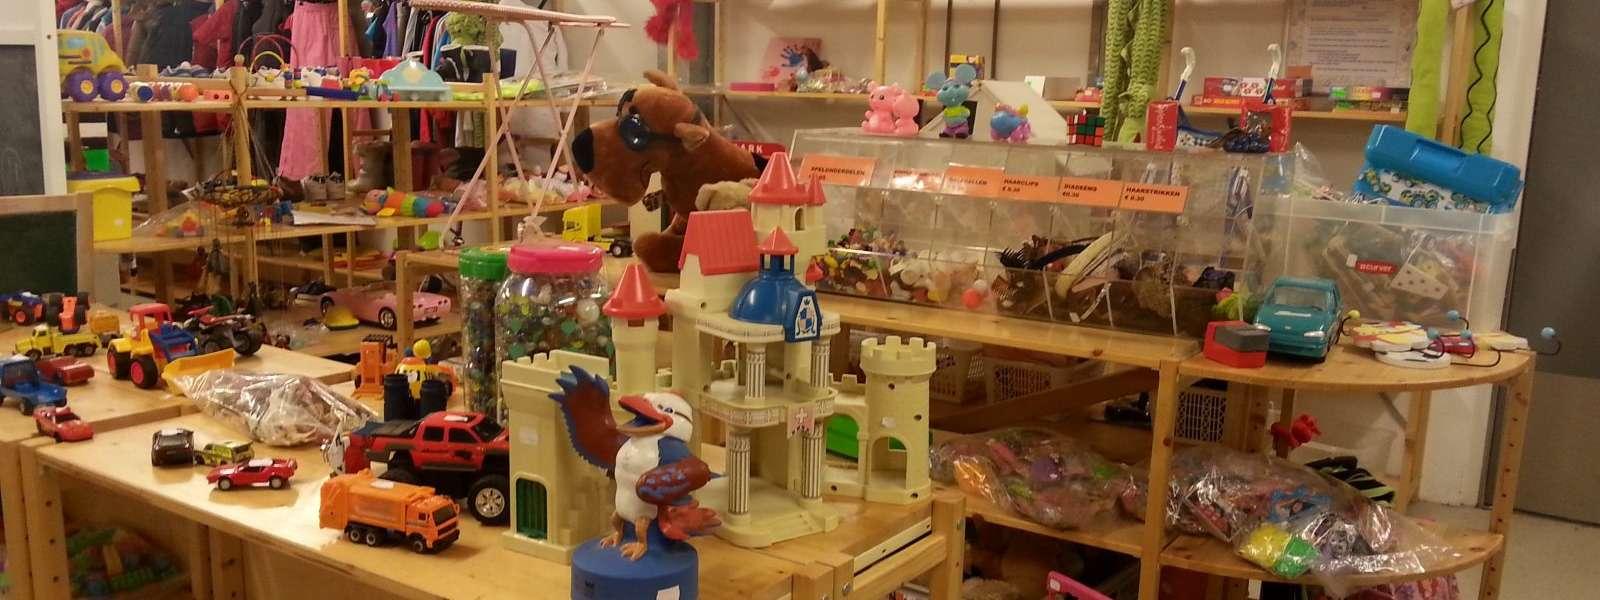 Speelgoed-KringloopCentrum-Eemnes